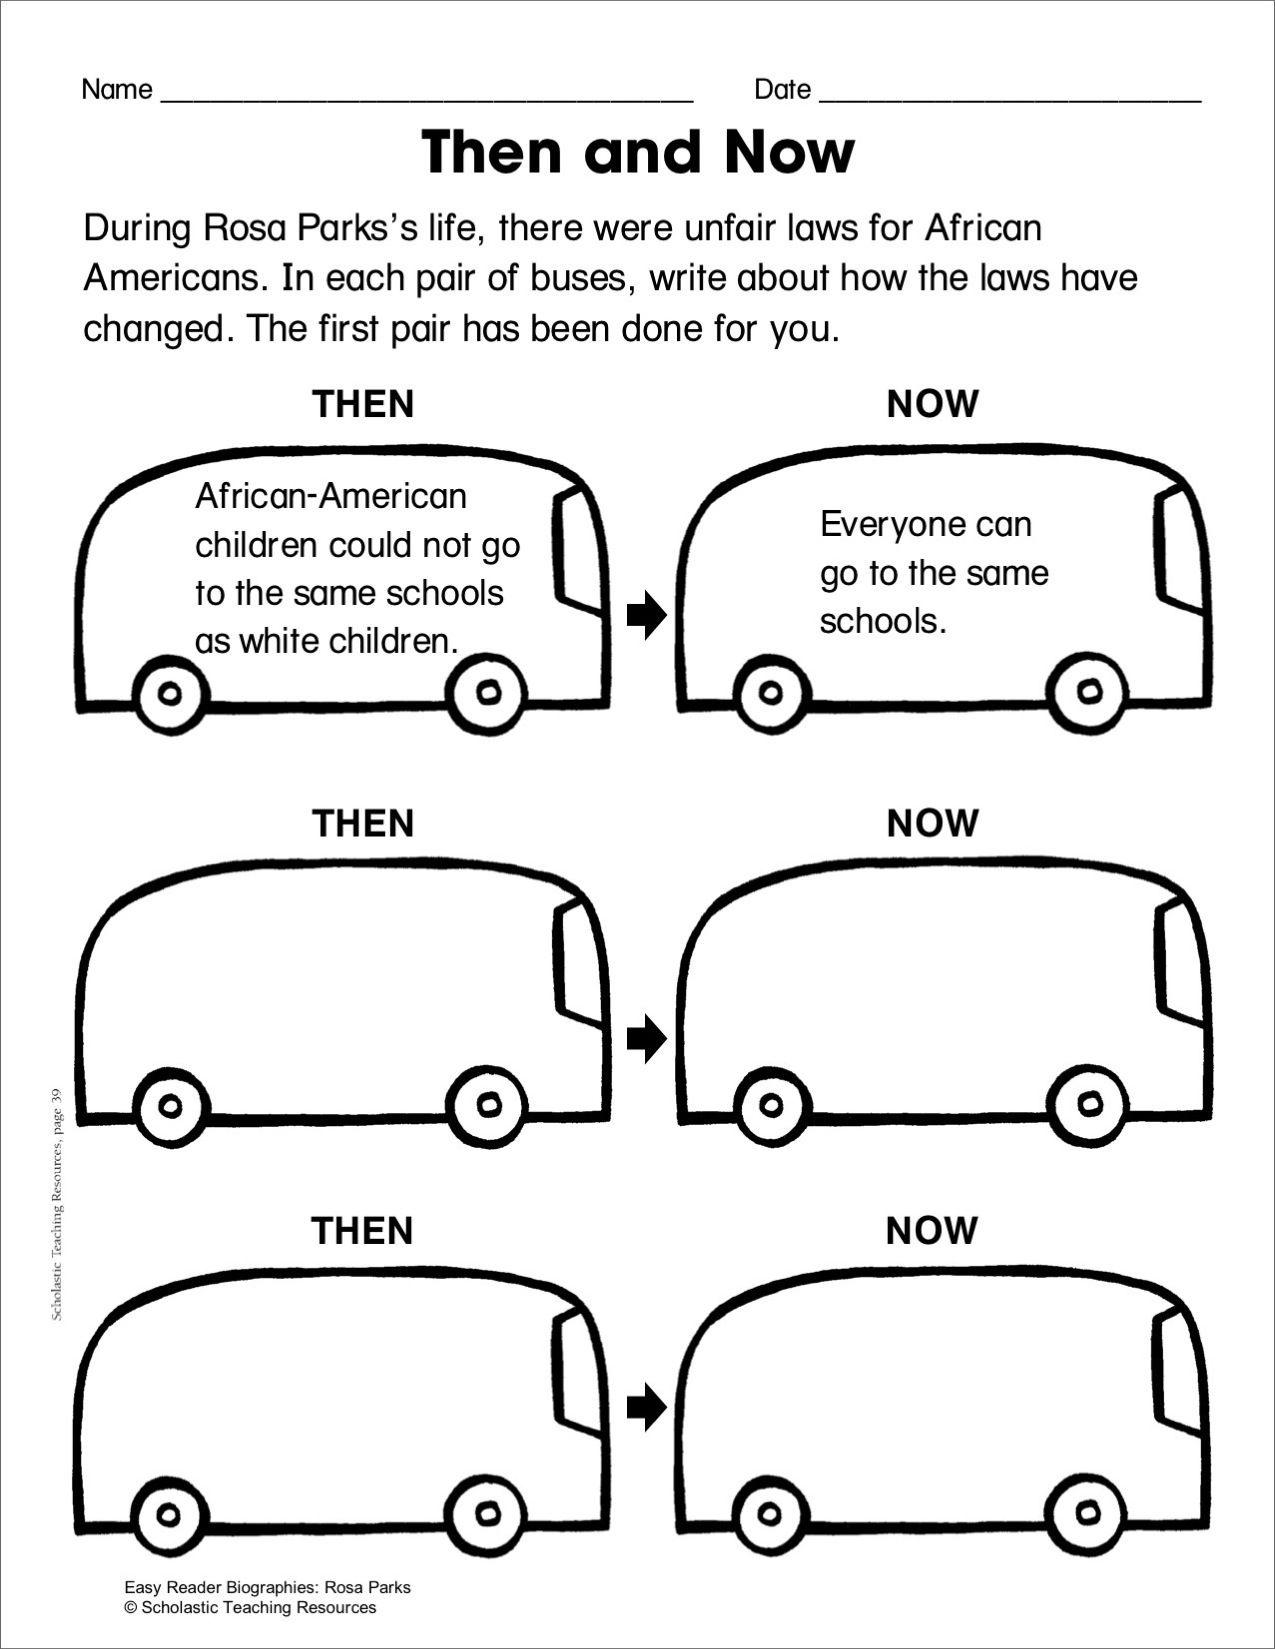 Rosa Parks Lesson Plan Worksheet Printables Proyectos Escolares Escolares Historia [ 1649 x 1275 Pixel ]